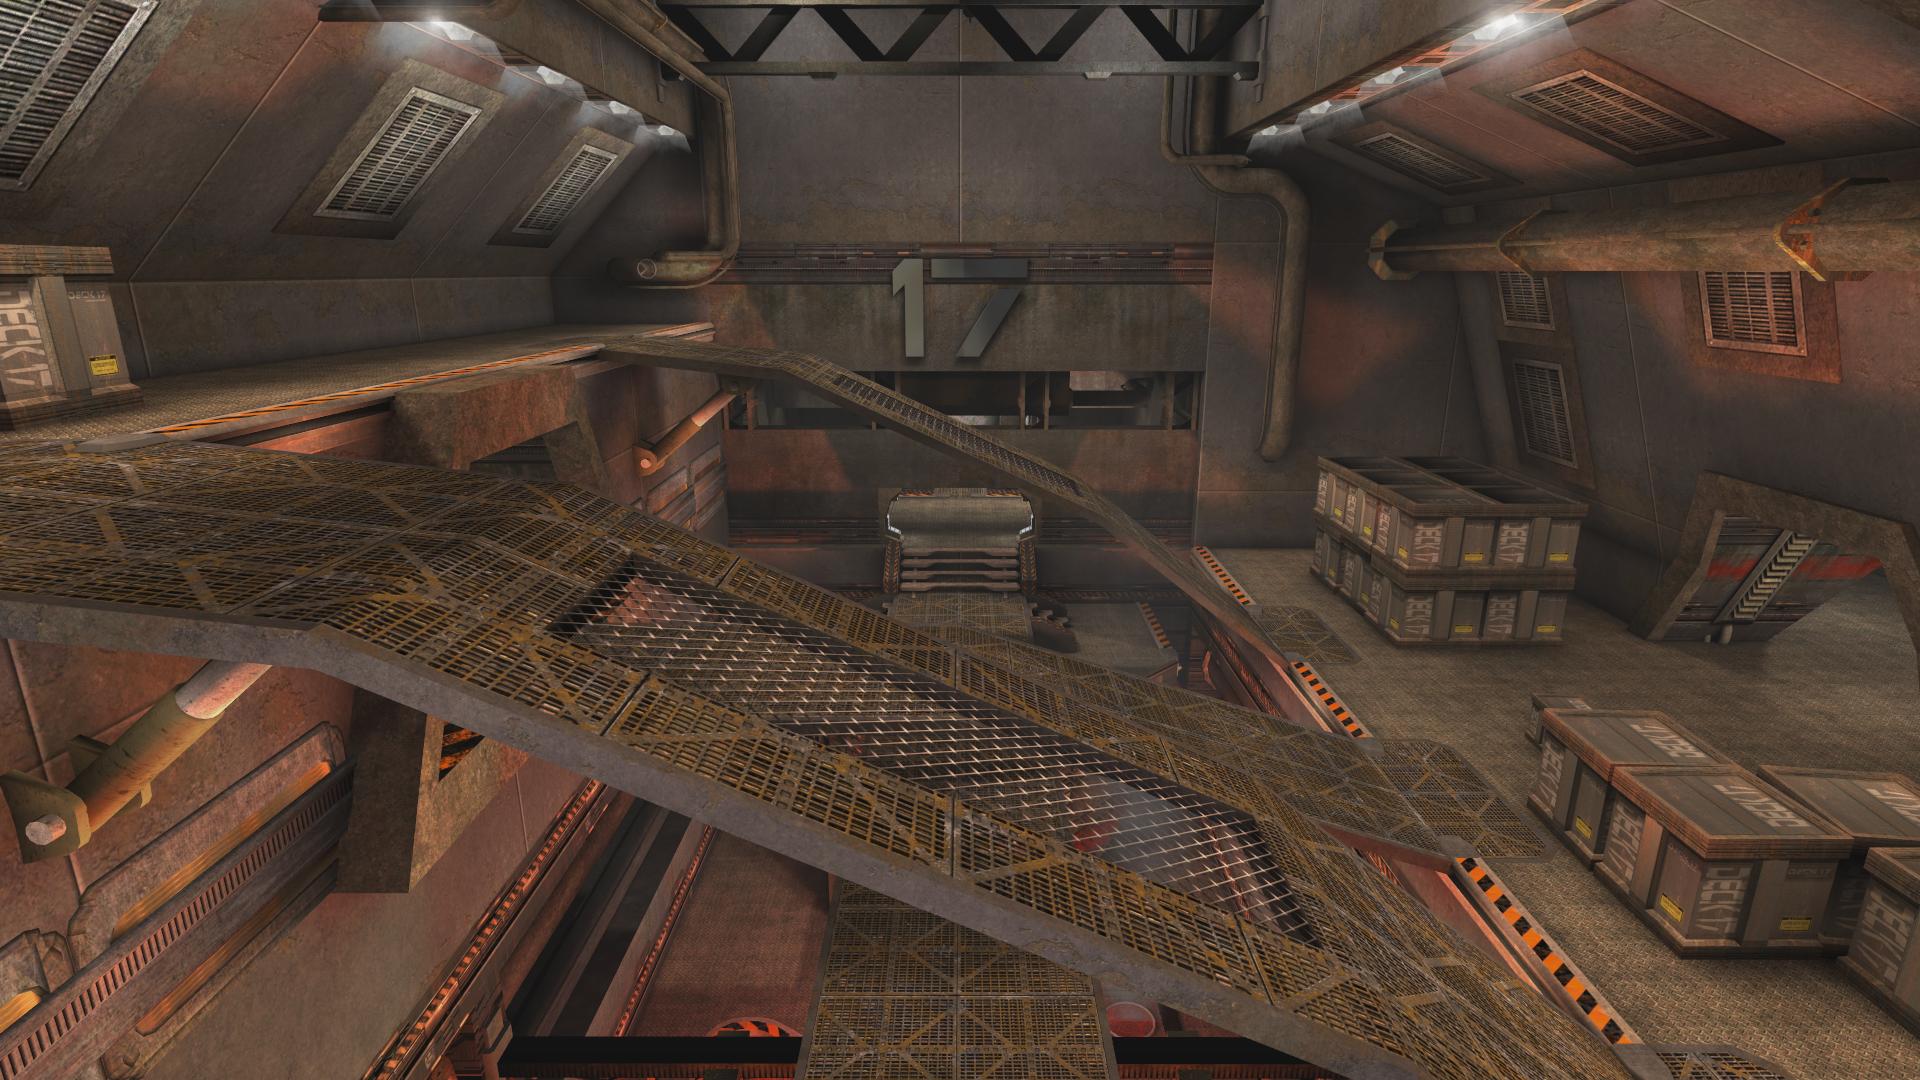 Deck. Эволюция.1. Unreal Tournament (1999)2. Unreal Tournament 2004 (2004)3. Unreal Tournament 3 (2007) - Изображение 2